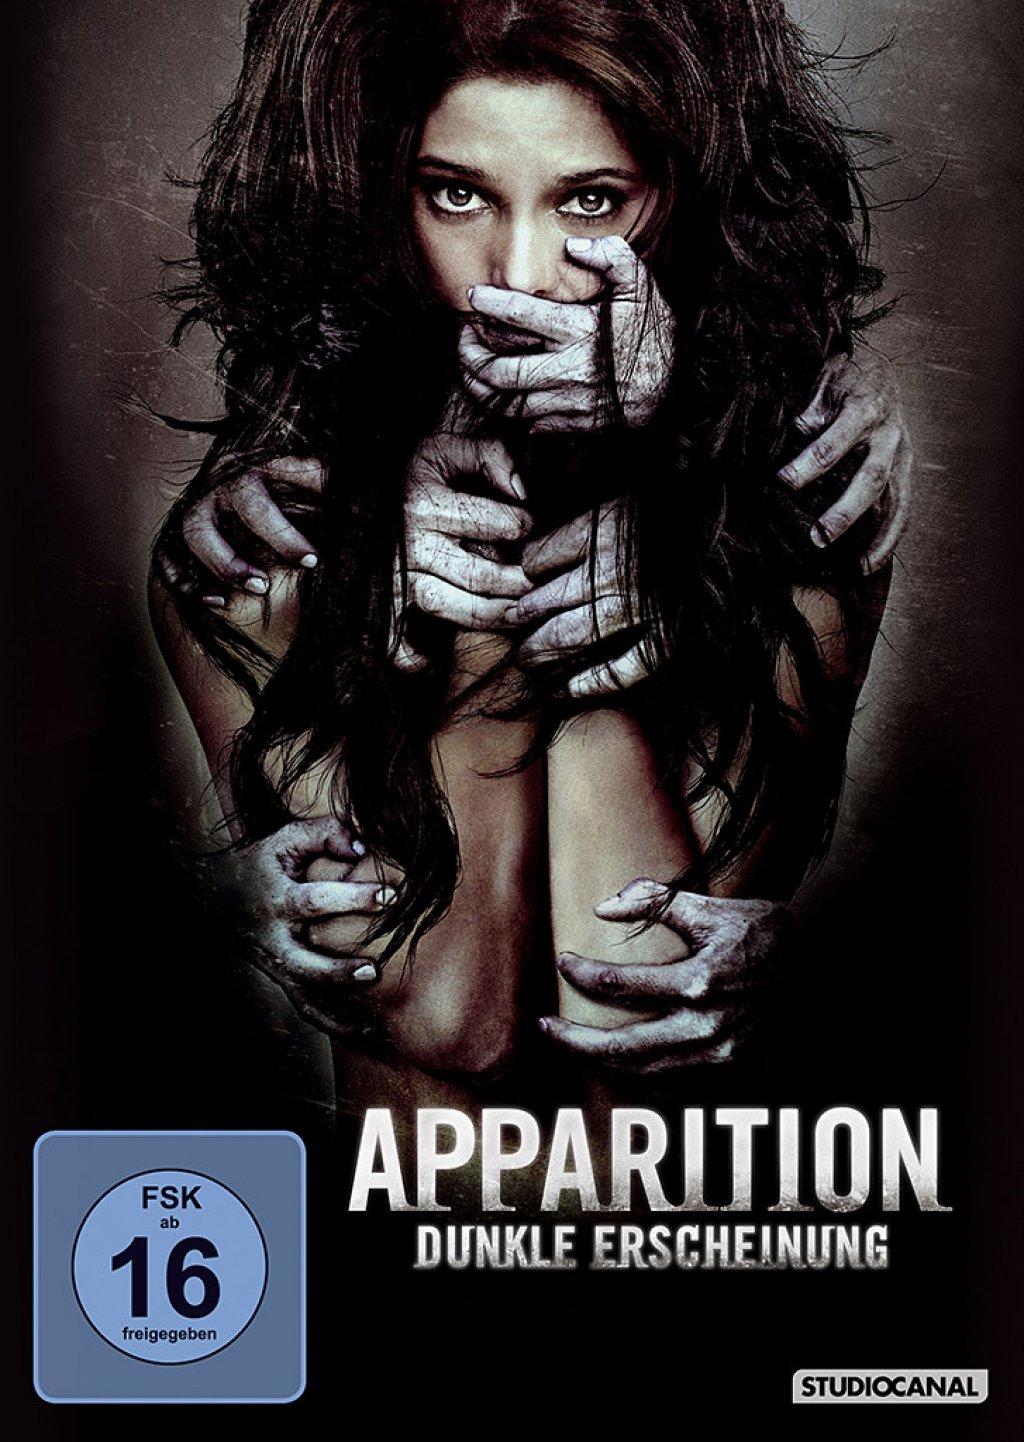 Apparition - Dunkle Erscheinung (DVD)